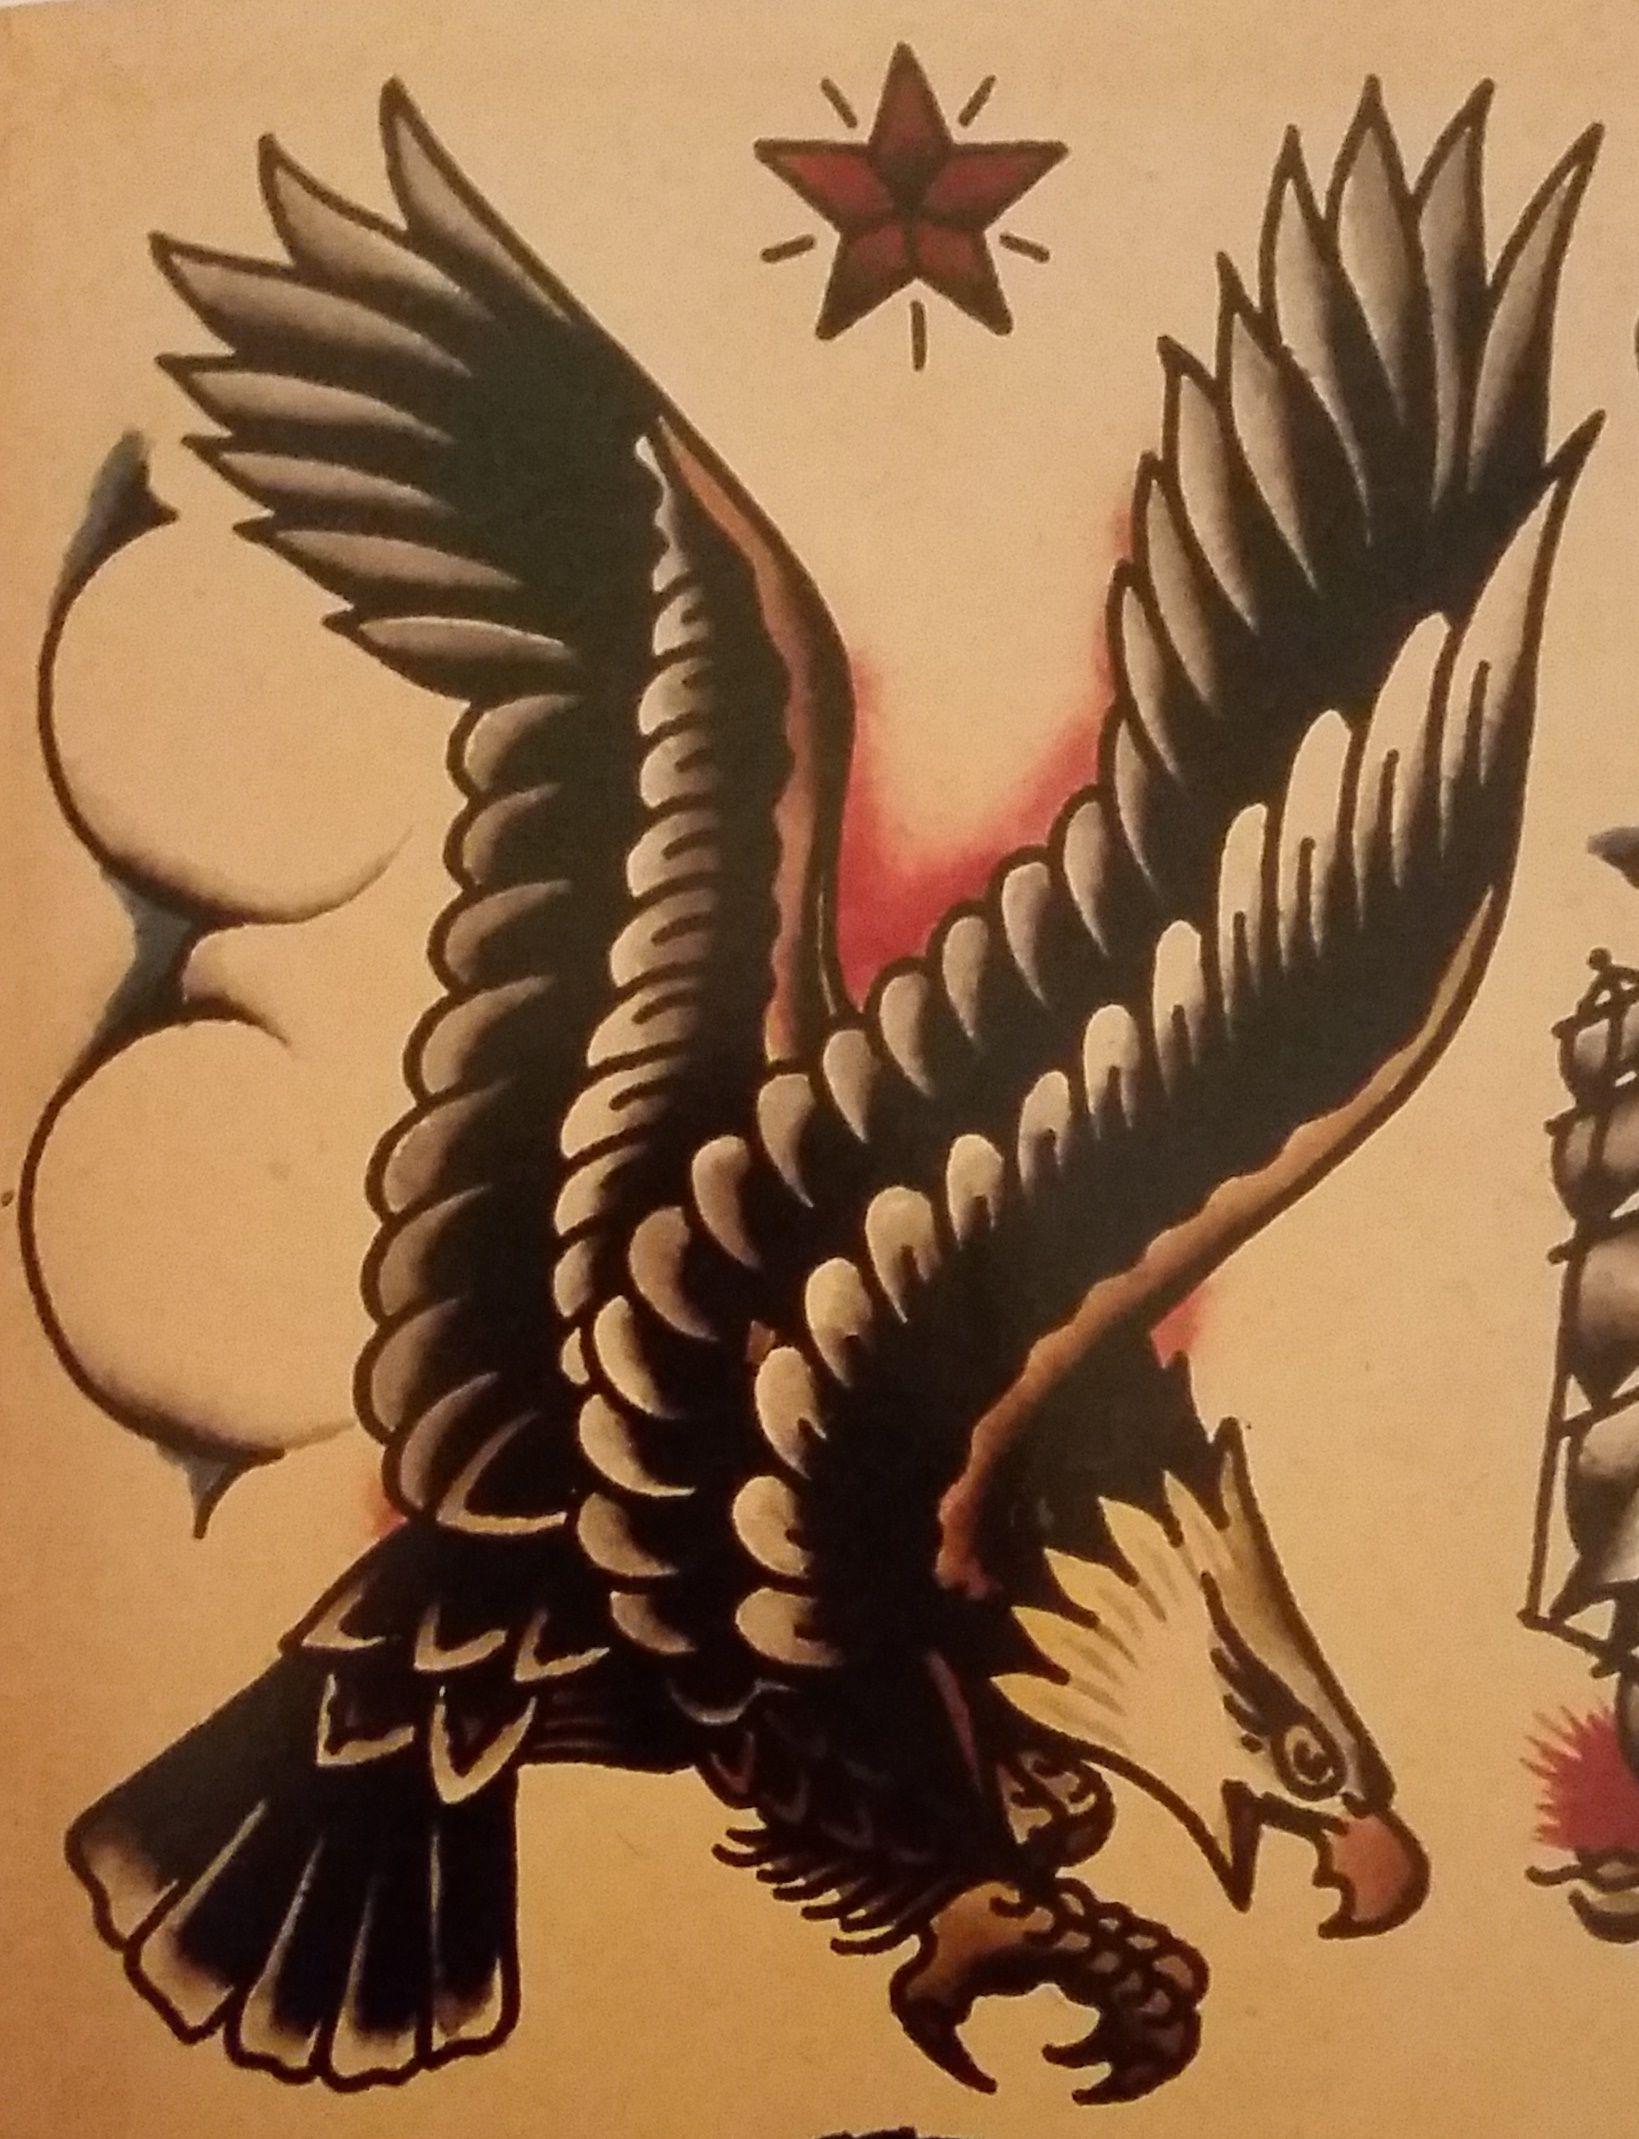 dd67c89f38af3 Traditional/old school tattoo, sailor jerry, eagle, bird | Tats ...